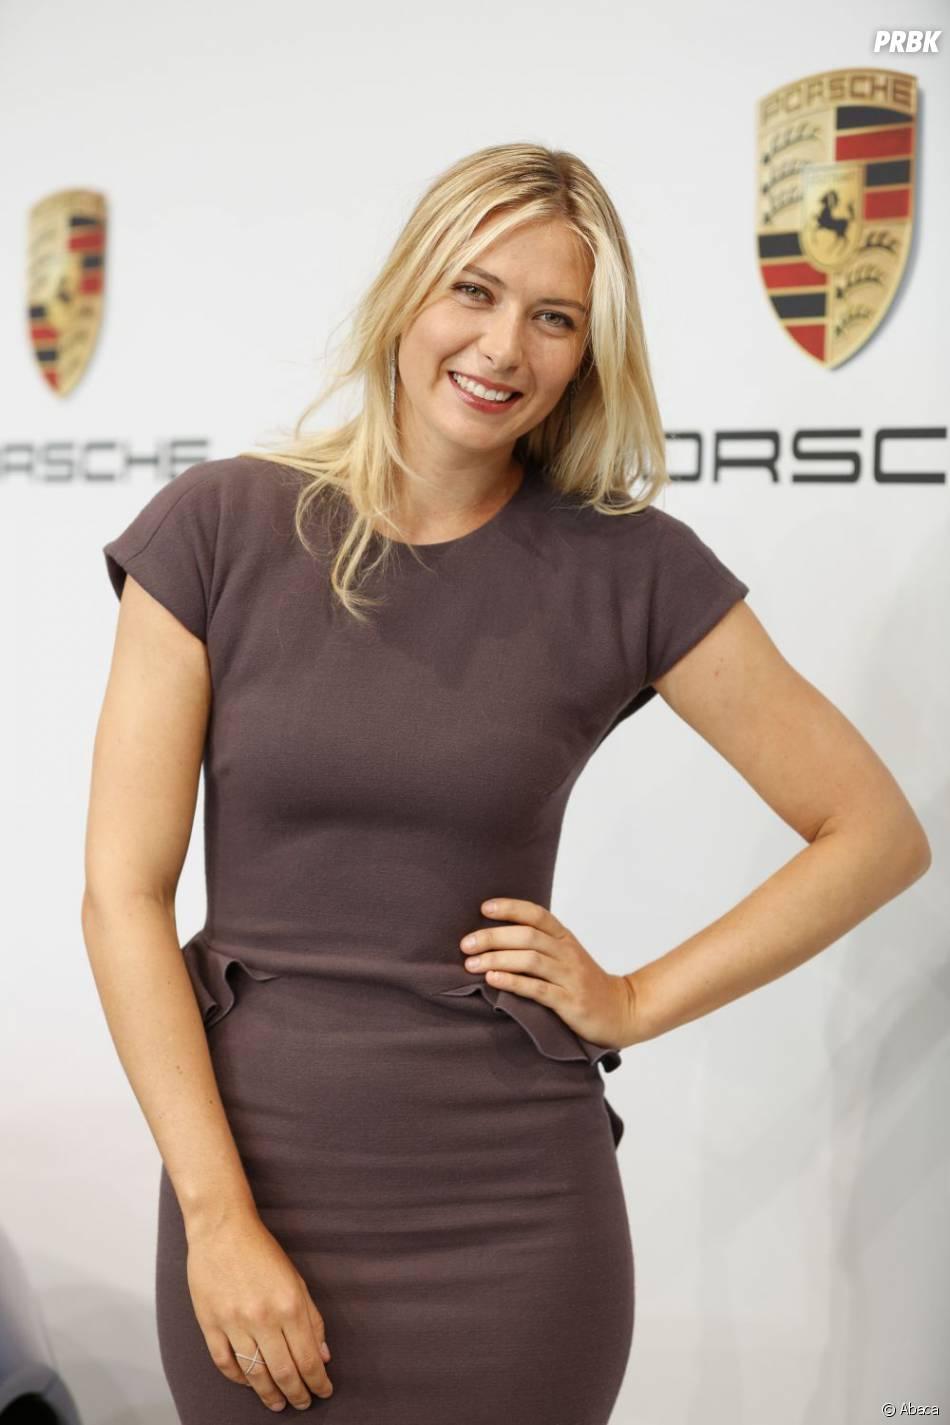 le tube russe de sexe Blonde sexe